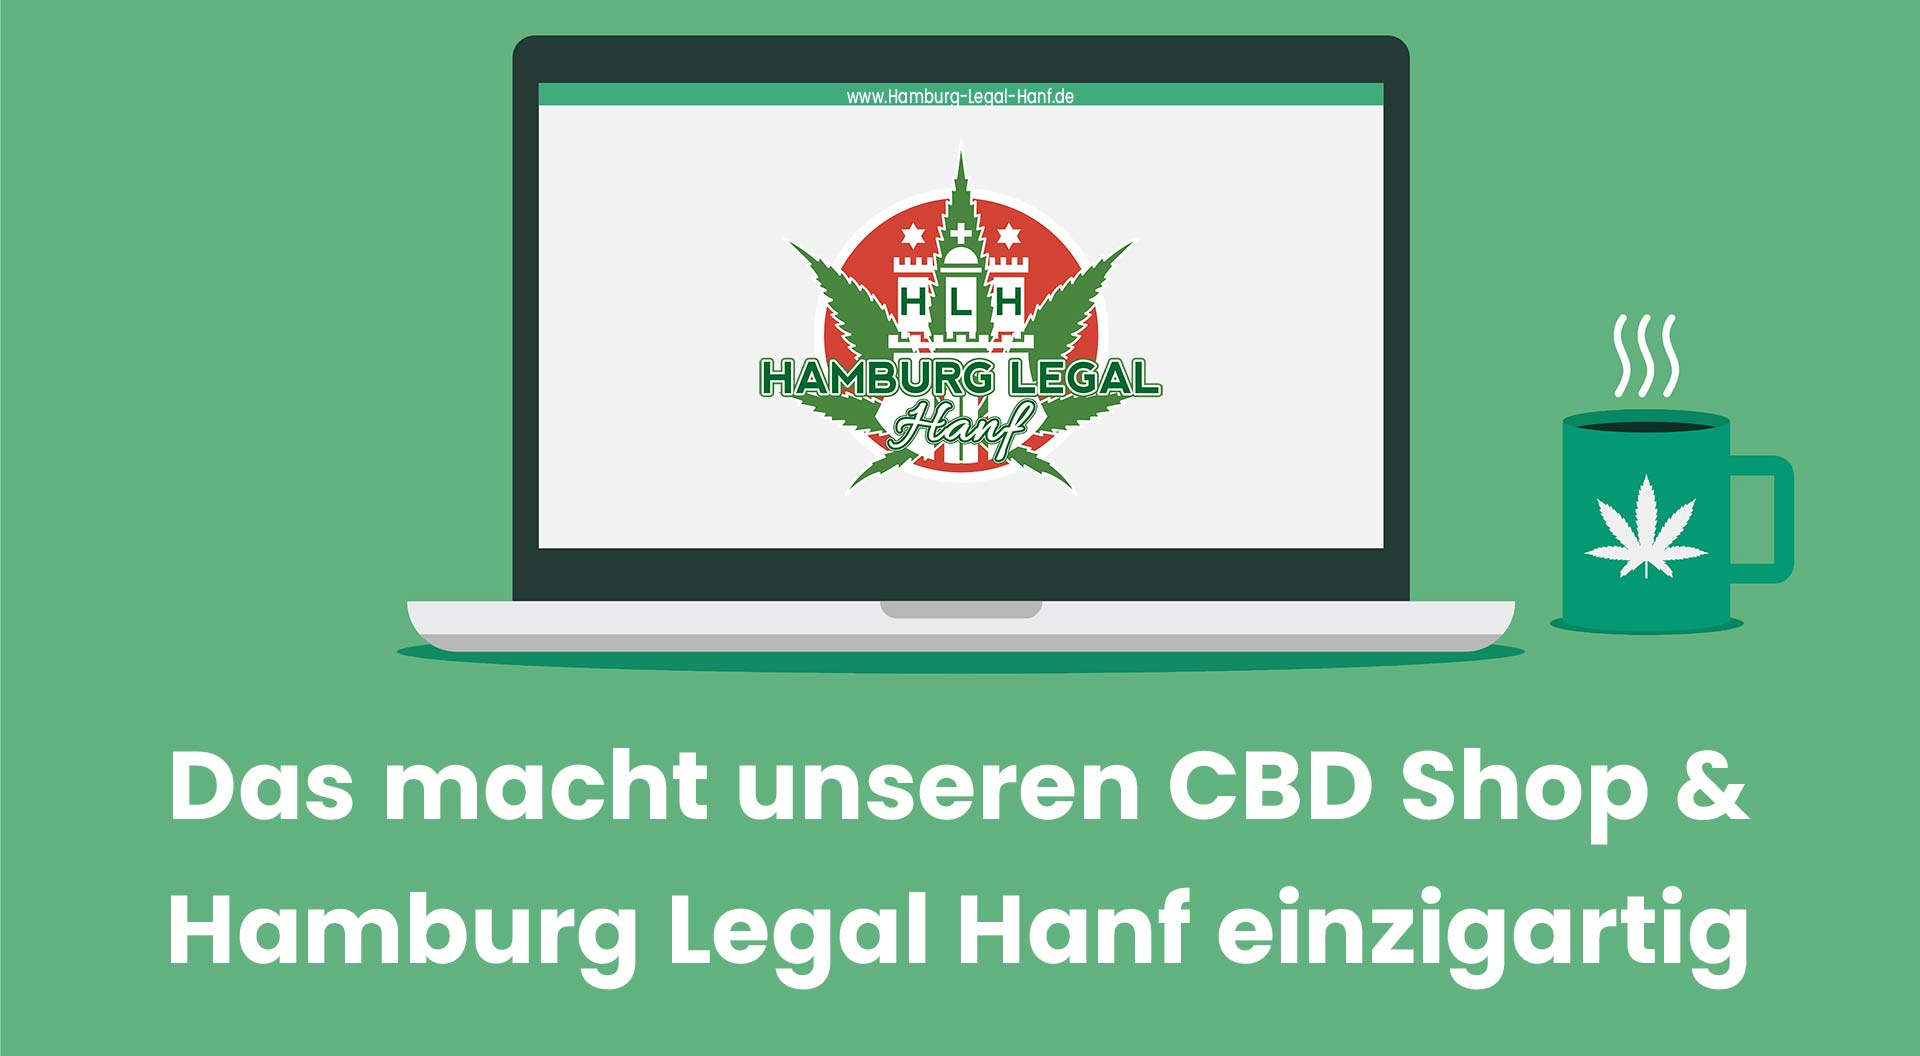 CBD Shop Hamburg-Legal-Hanf serös